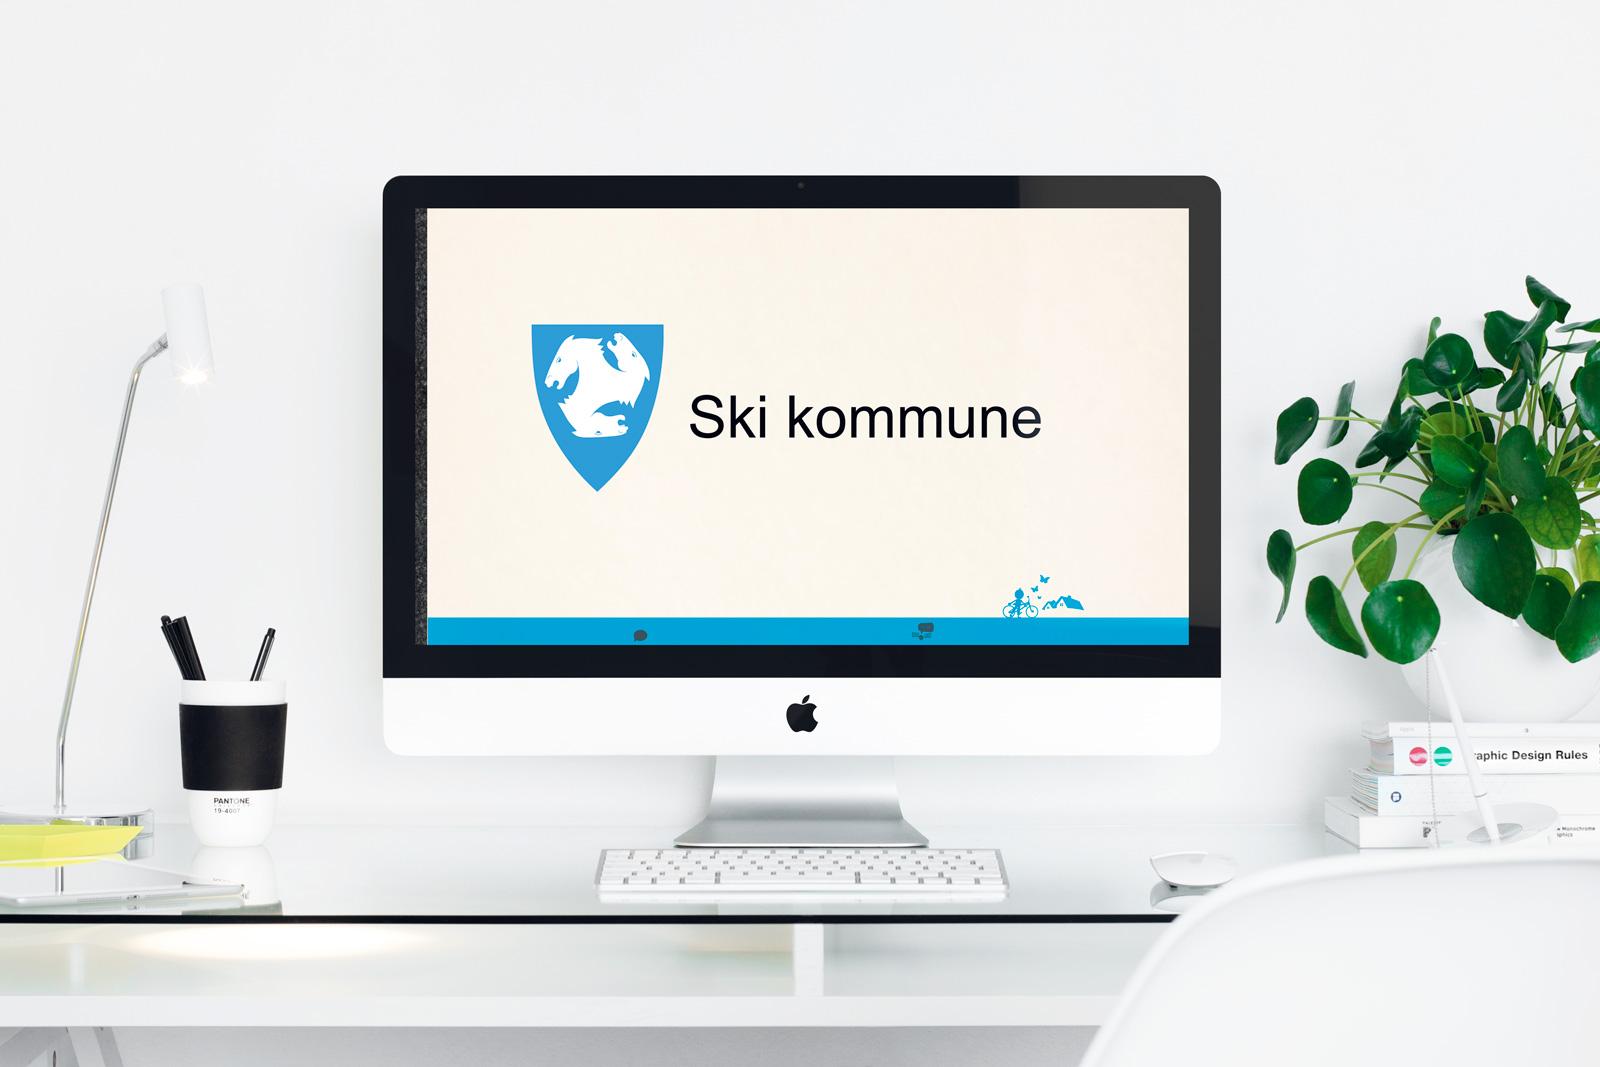 Ski_kommune_front